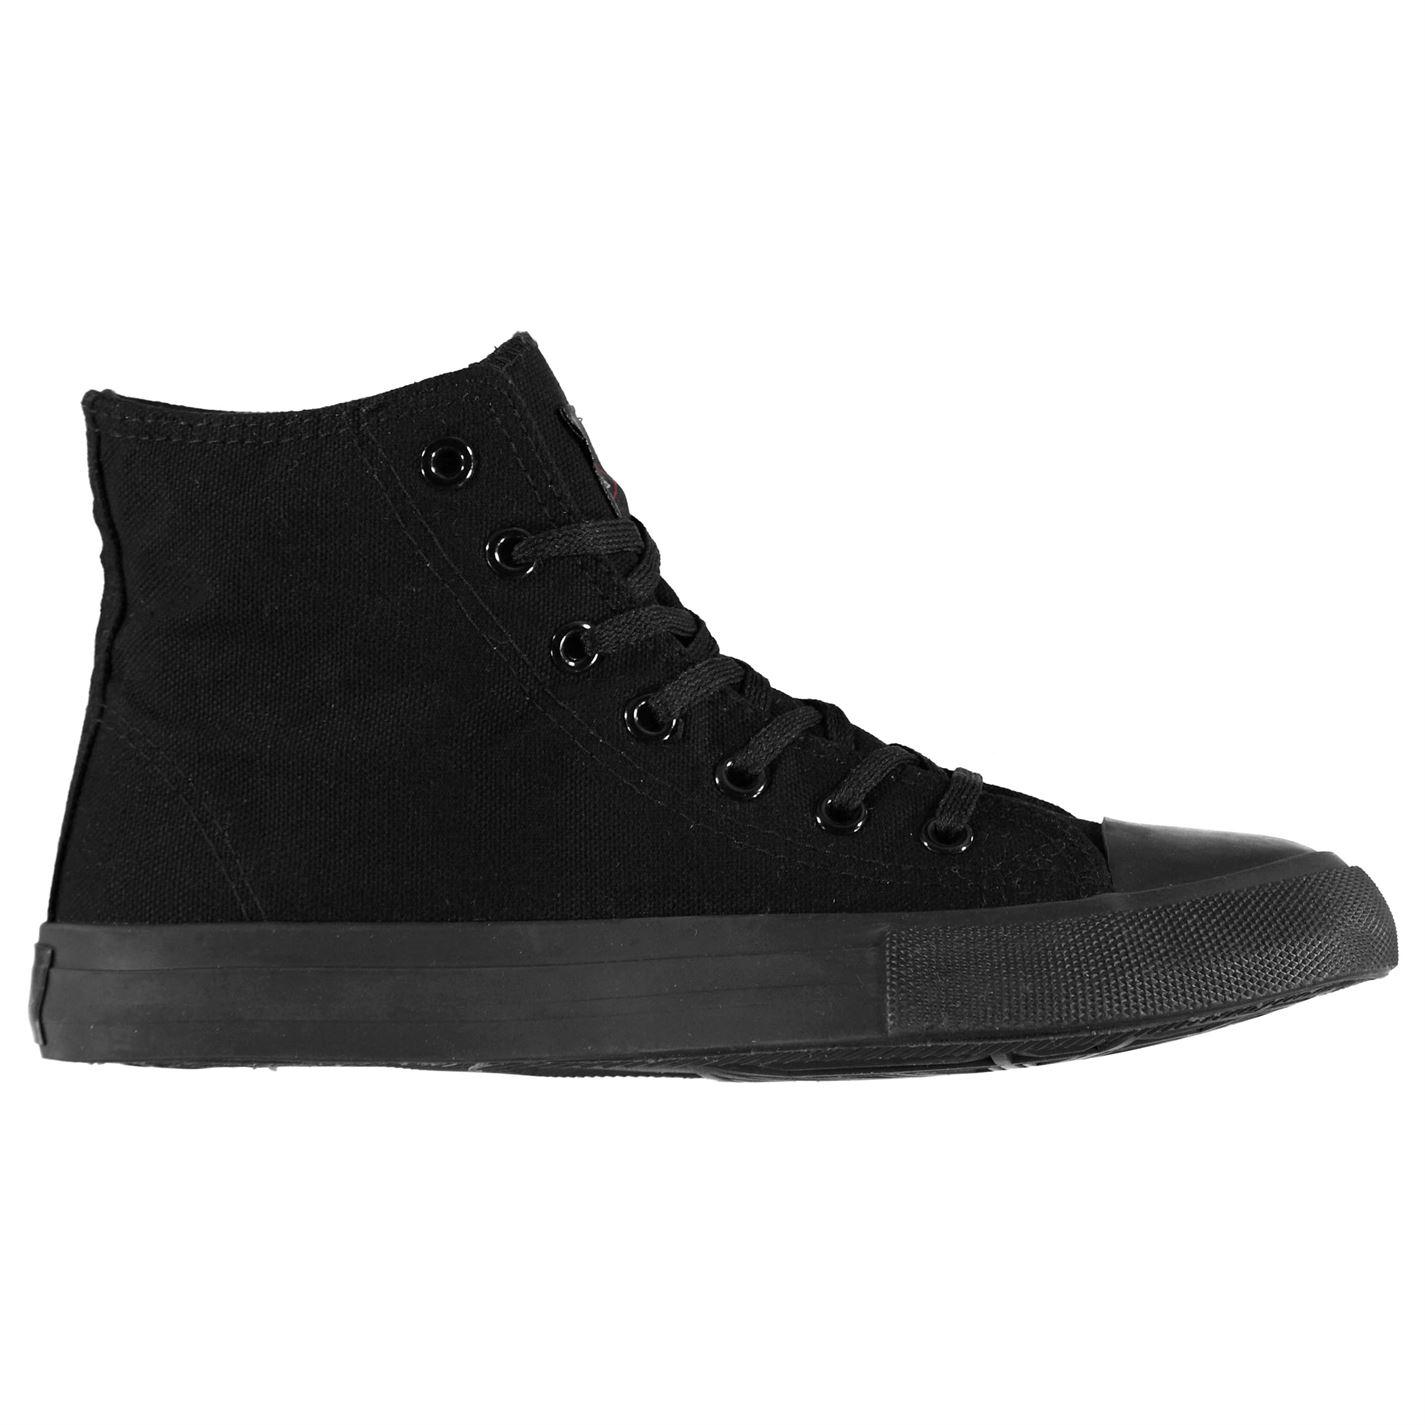 ee38b592f832 boty Lee Cooper Canvas Hi Top Shoes pánské